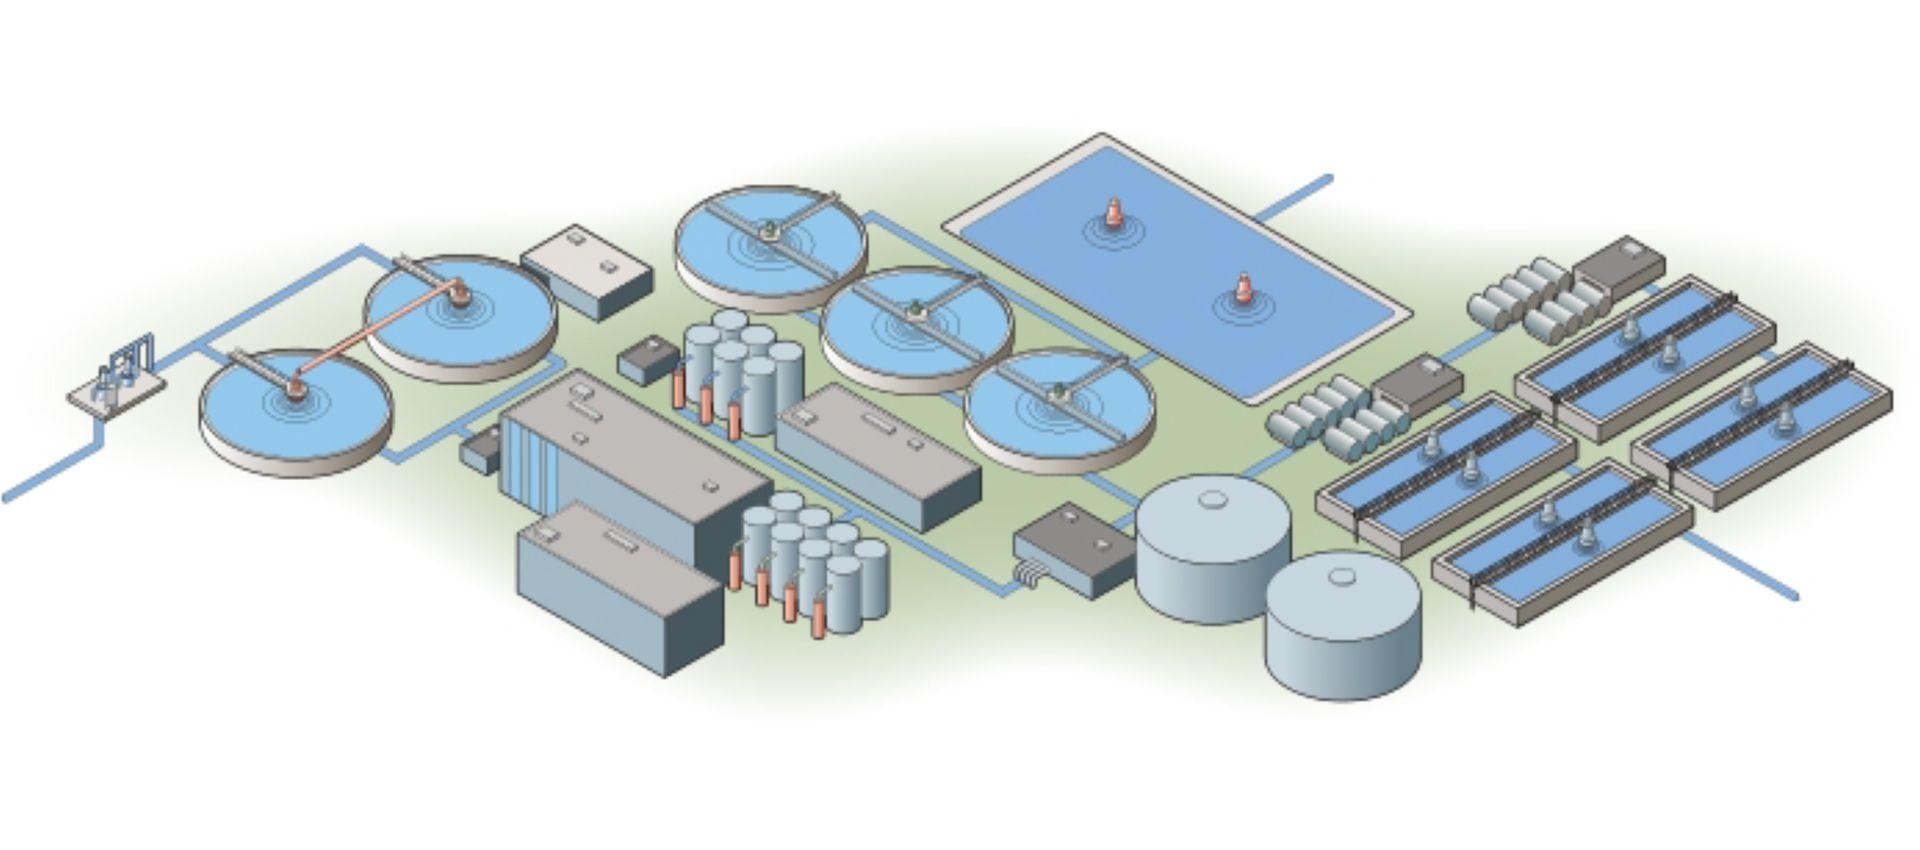 Wireless Industry Applications